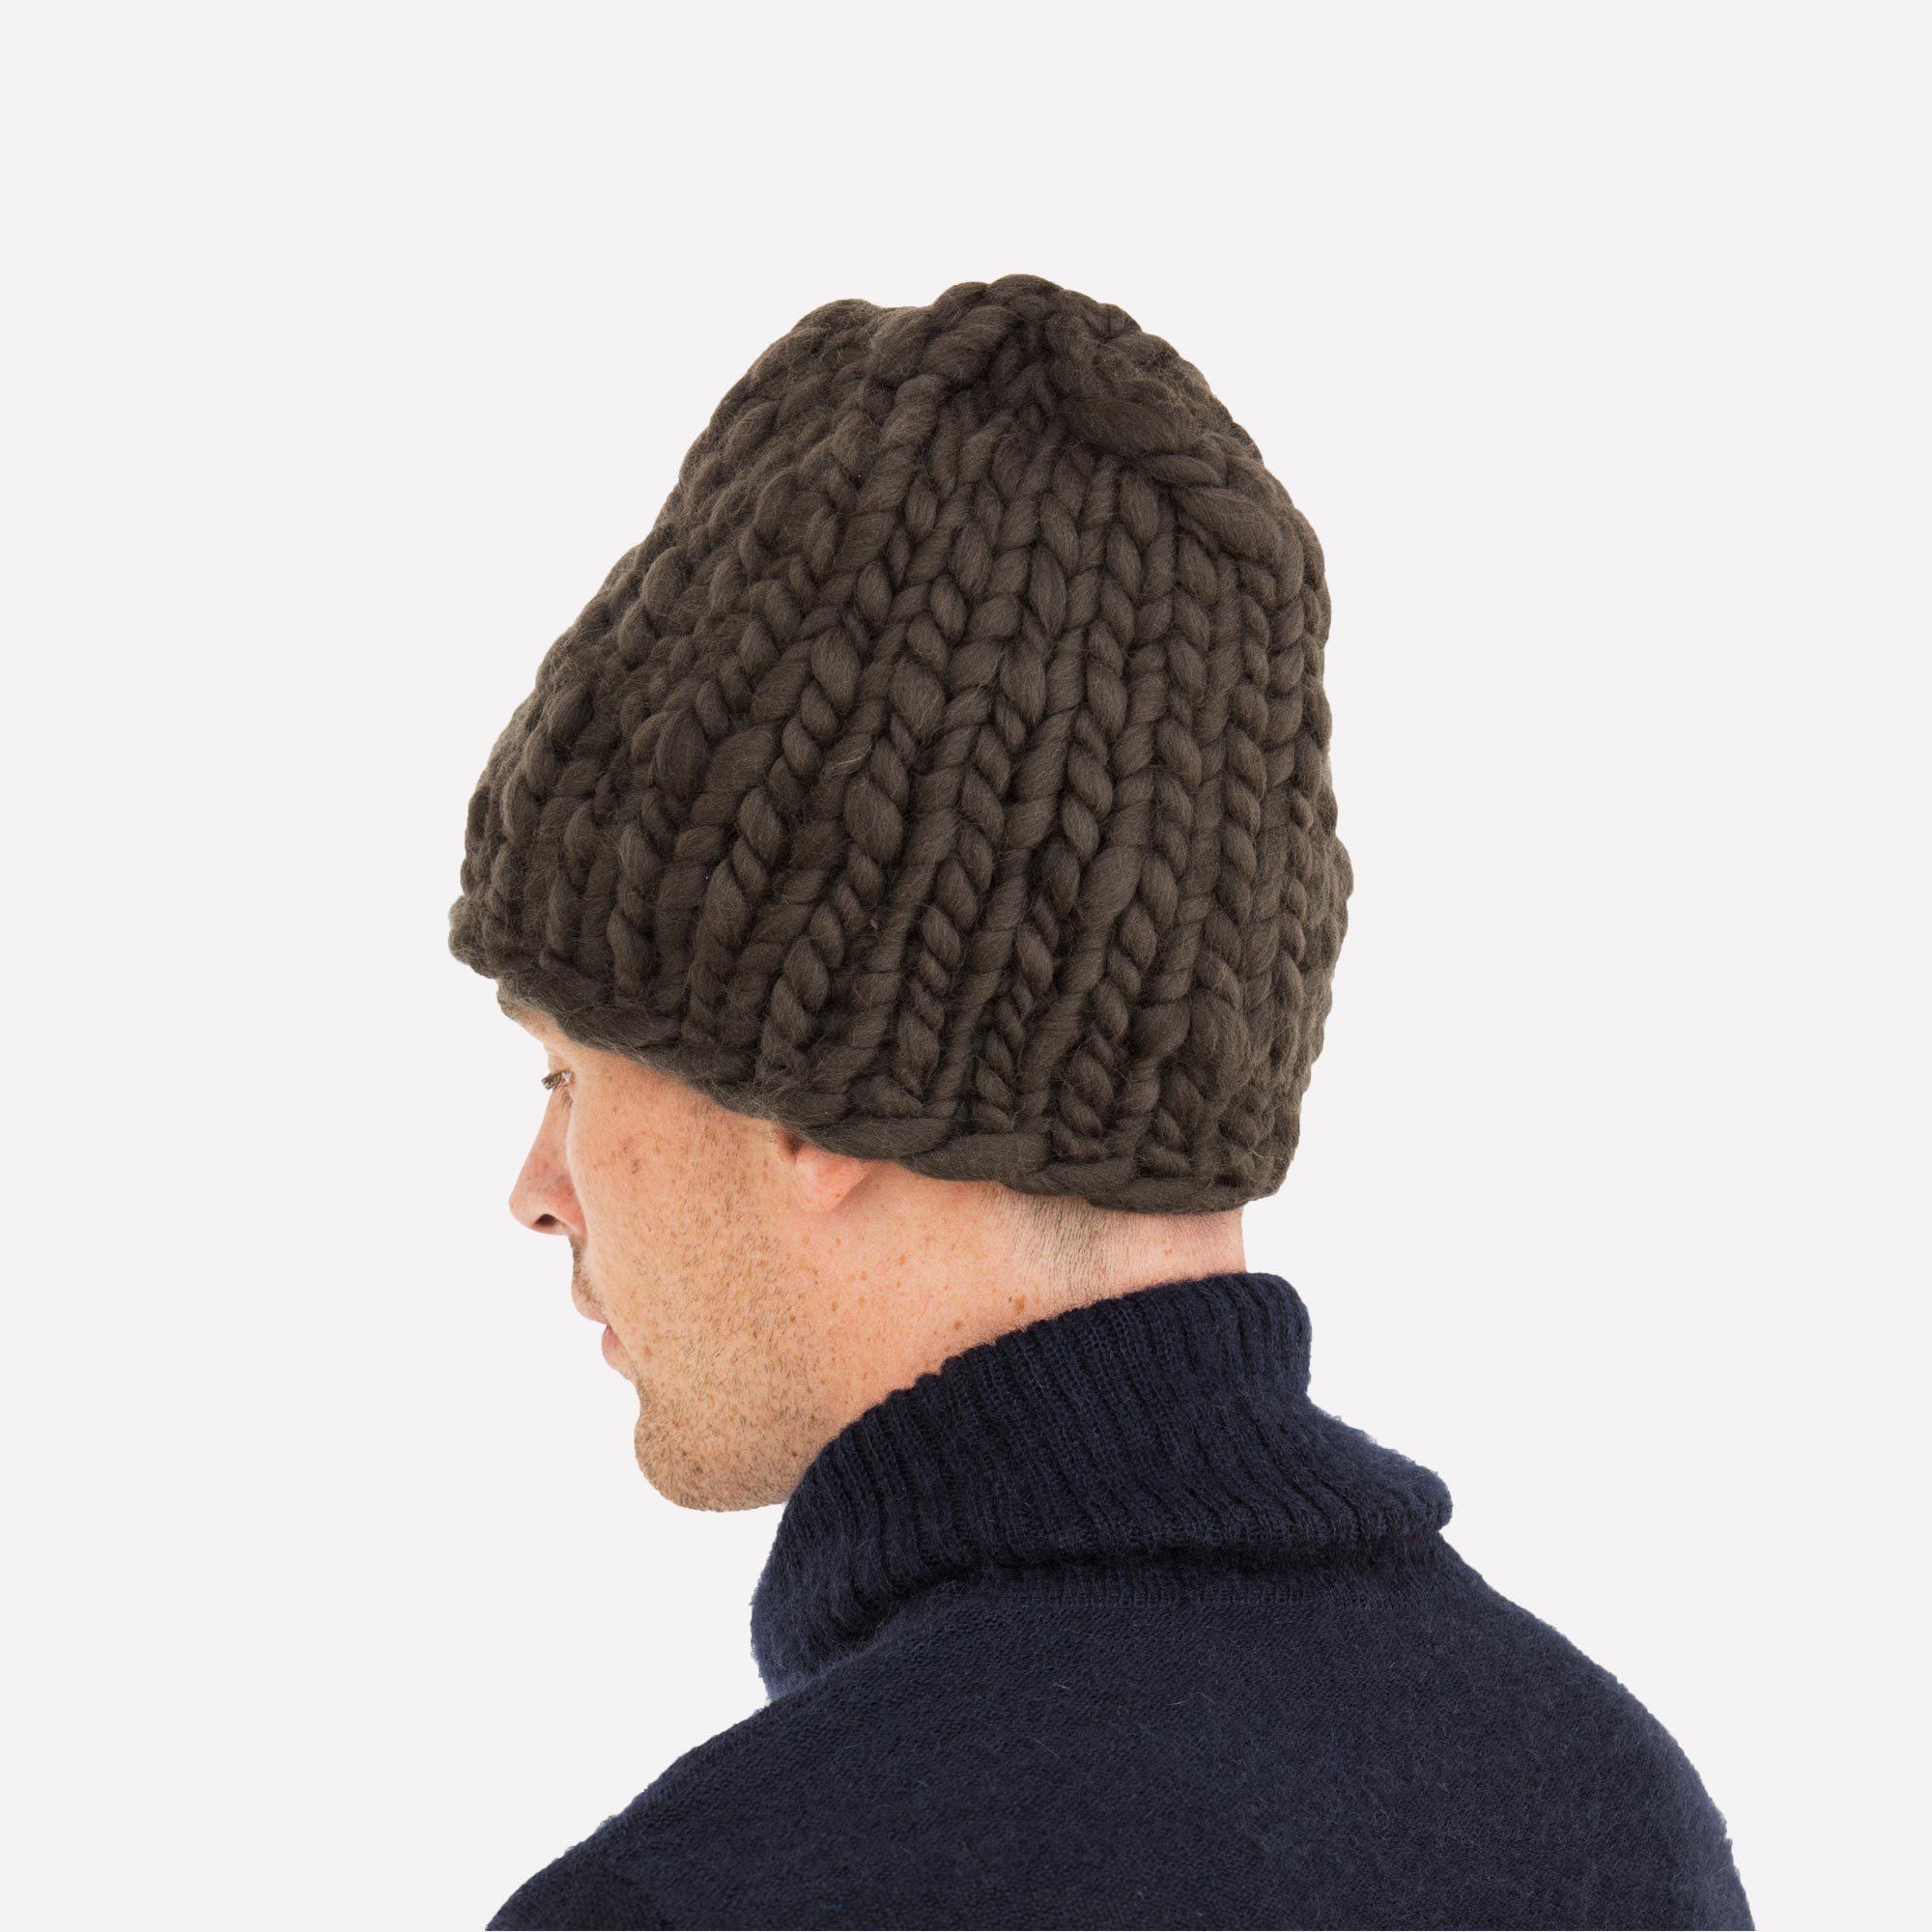 b9ddd46717c Men s Beanie Carbon Hand-Crocheted Merino Wool Hat